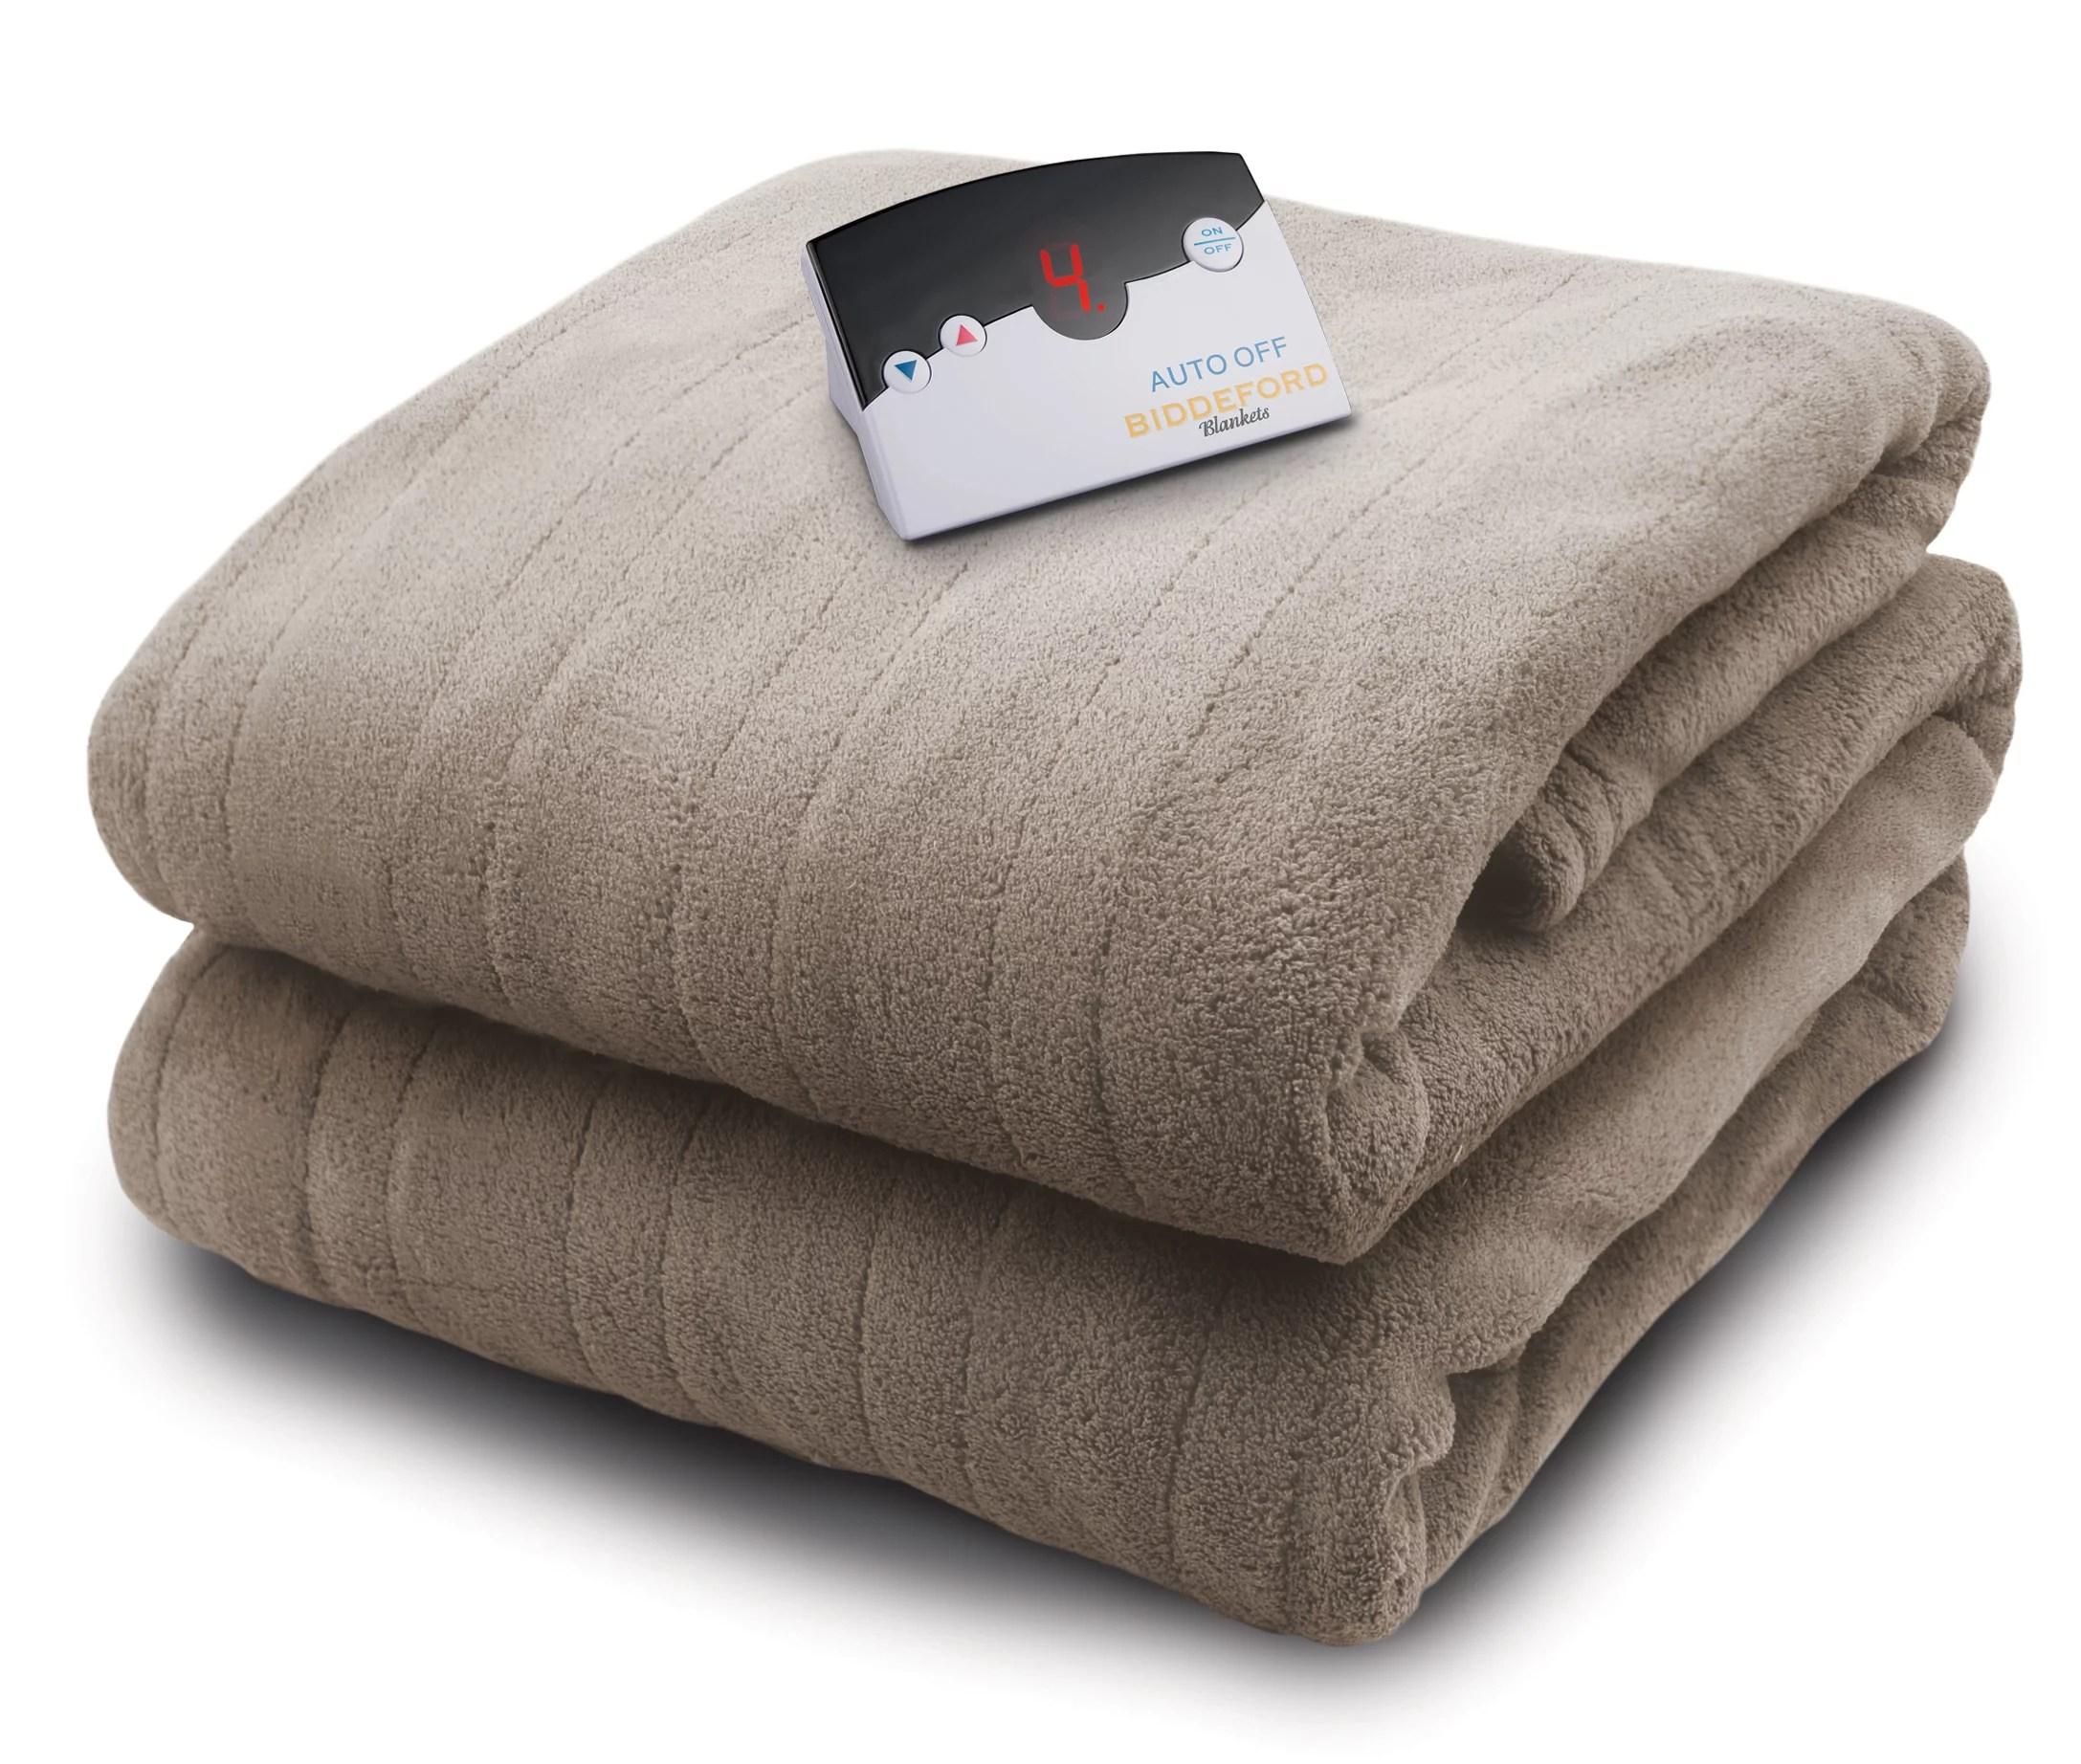 Biddeford Micro Plush Electric Heated Blanket With Digital Controller. Twin. Taupe - Walmart.com